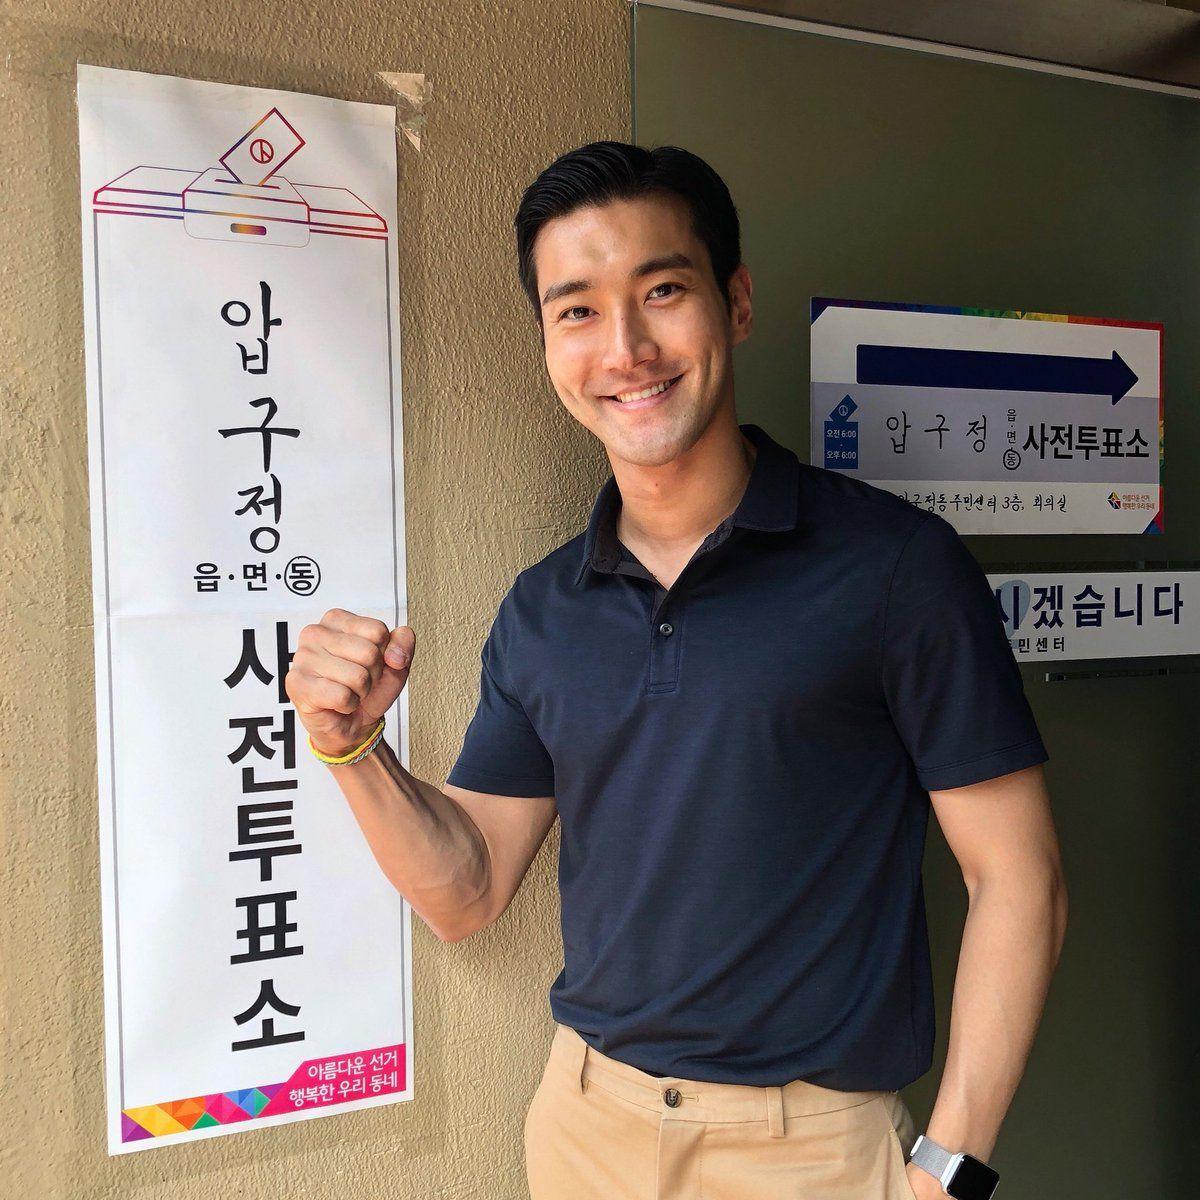 Siwon Choi on Twitter